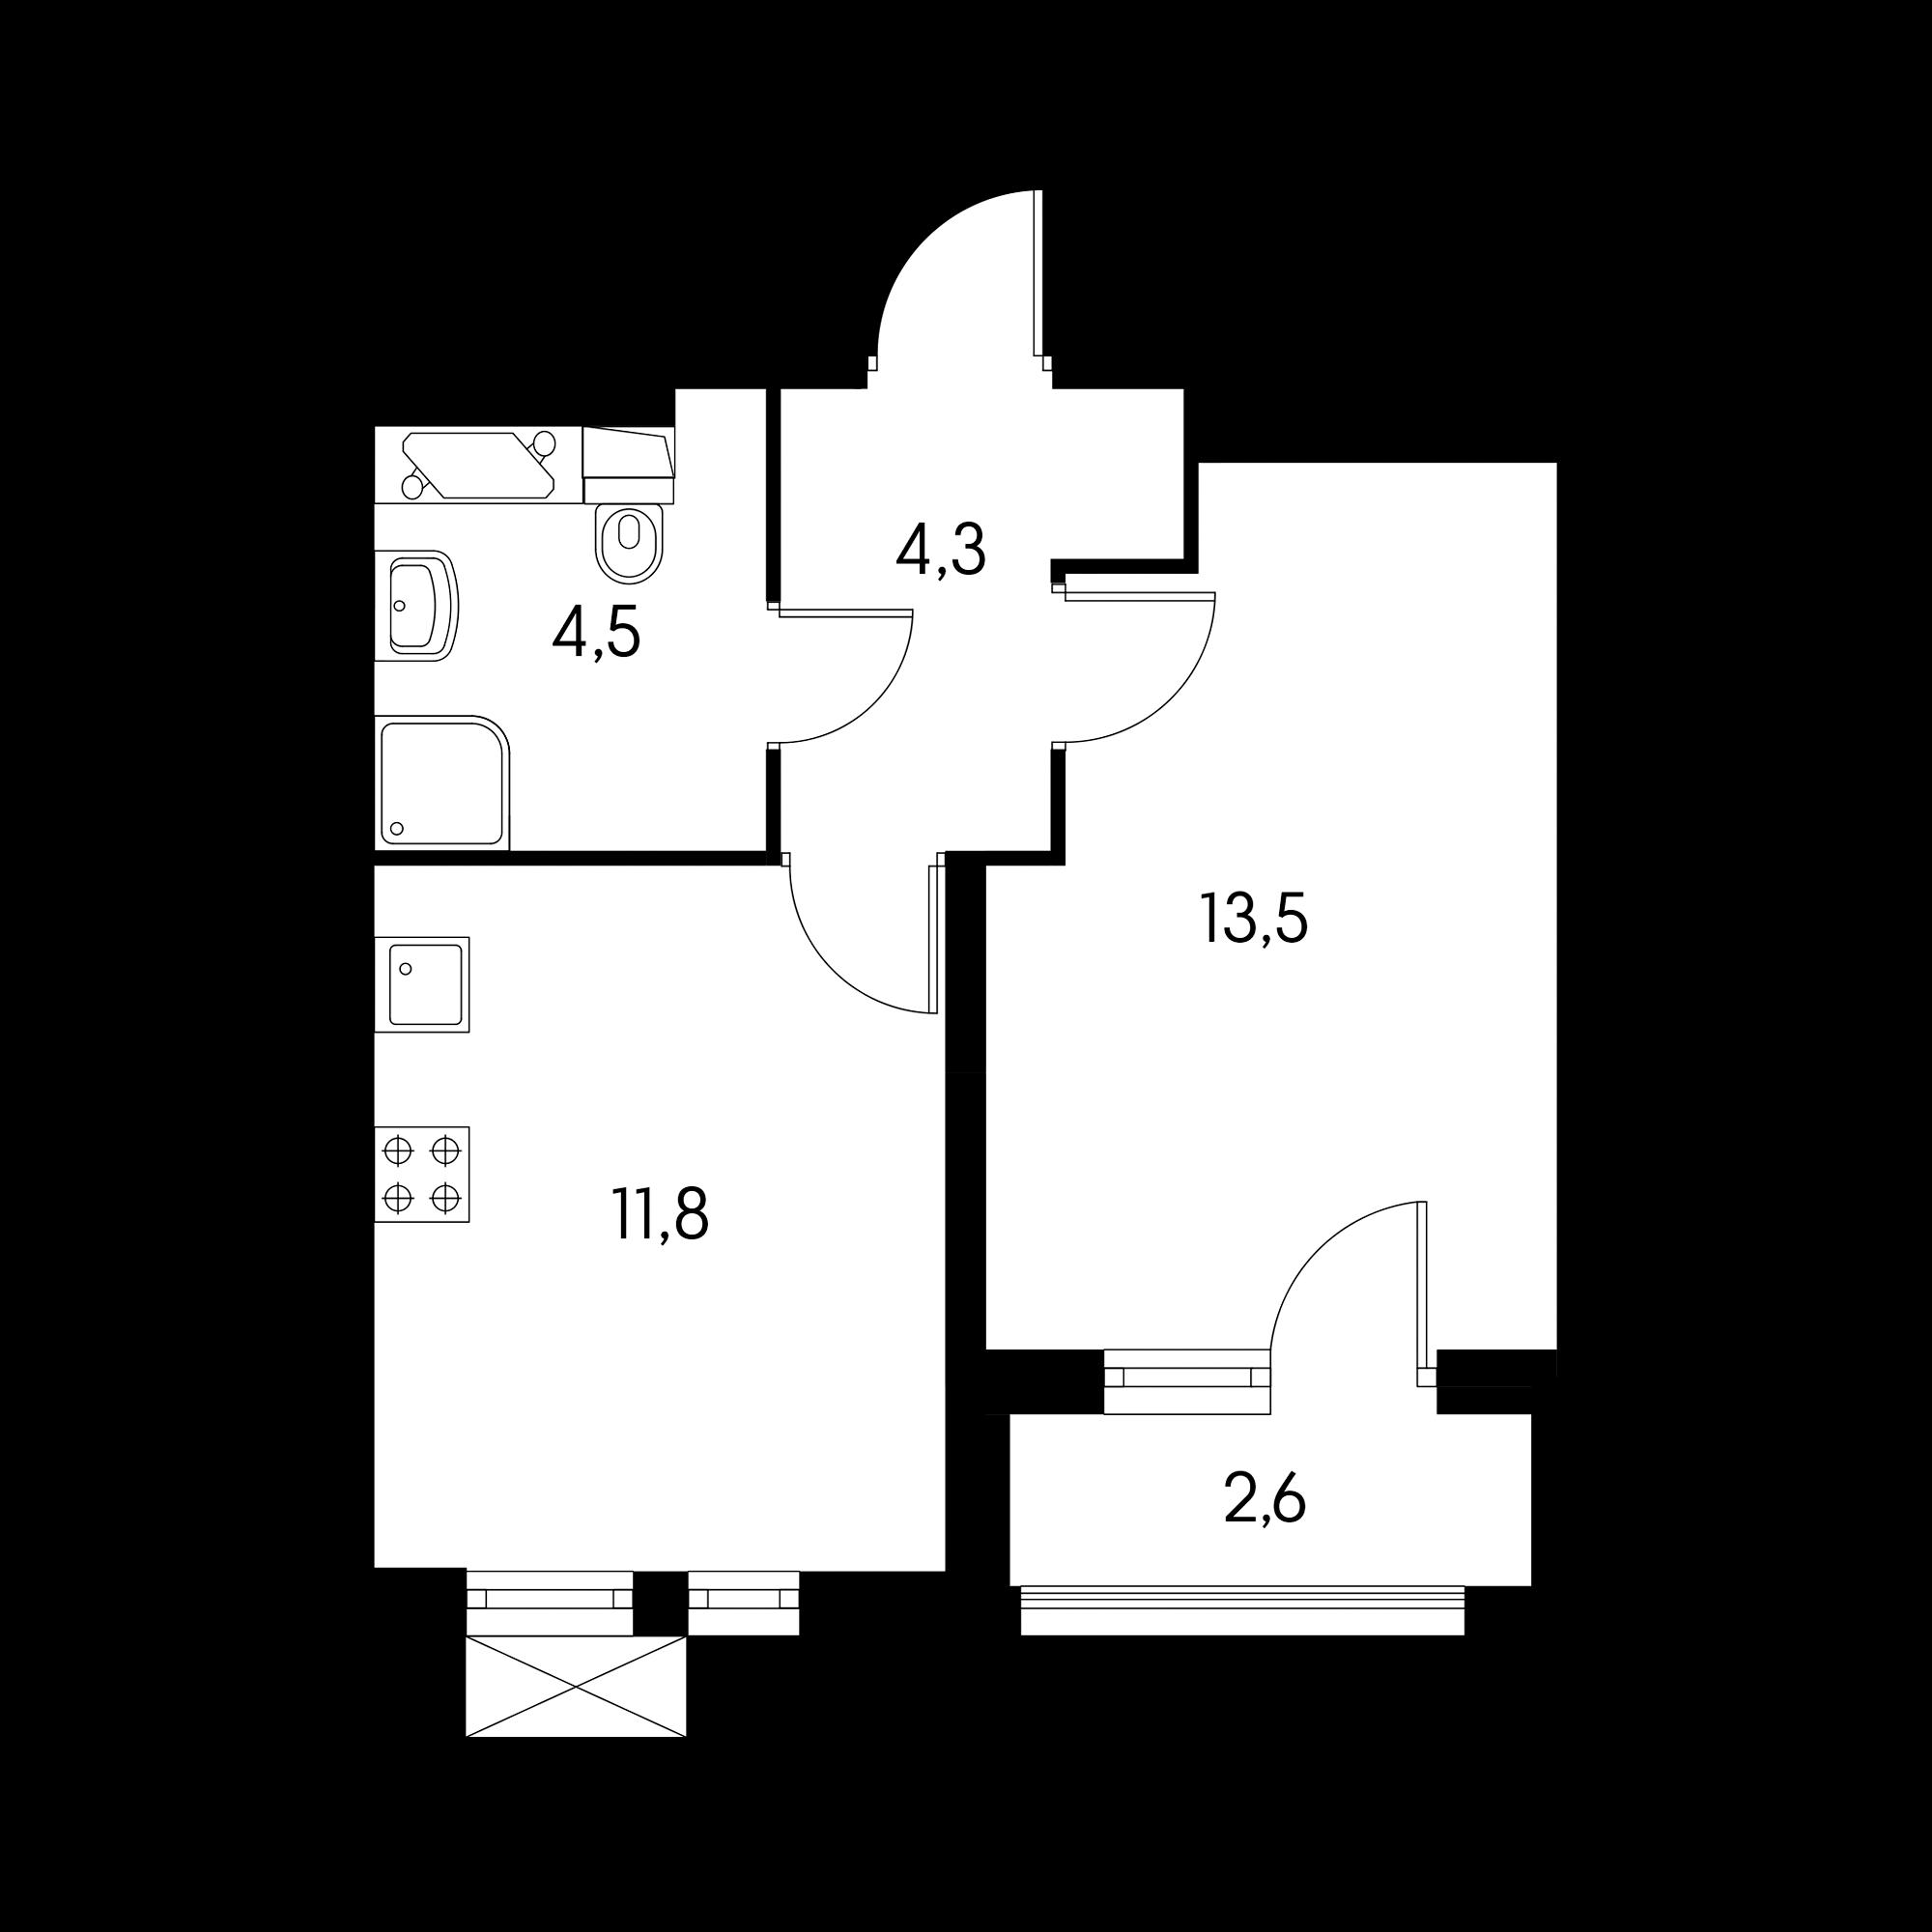 1-1(4)